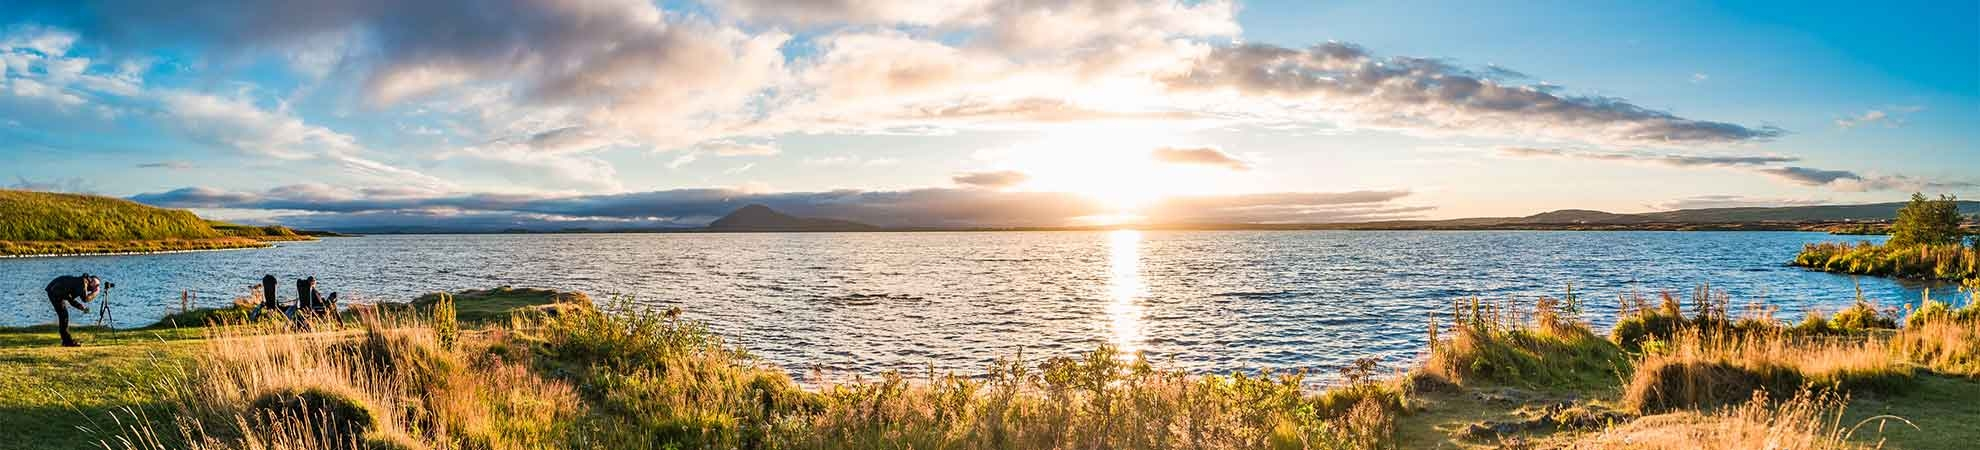 Voyage Lac Myvatn